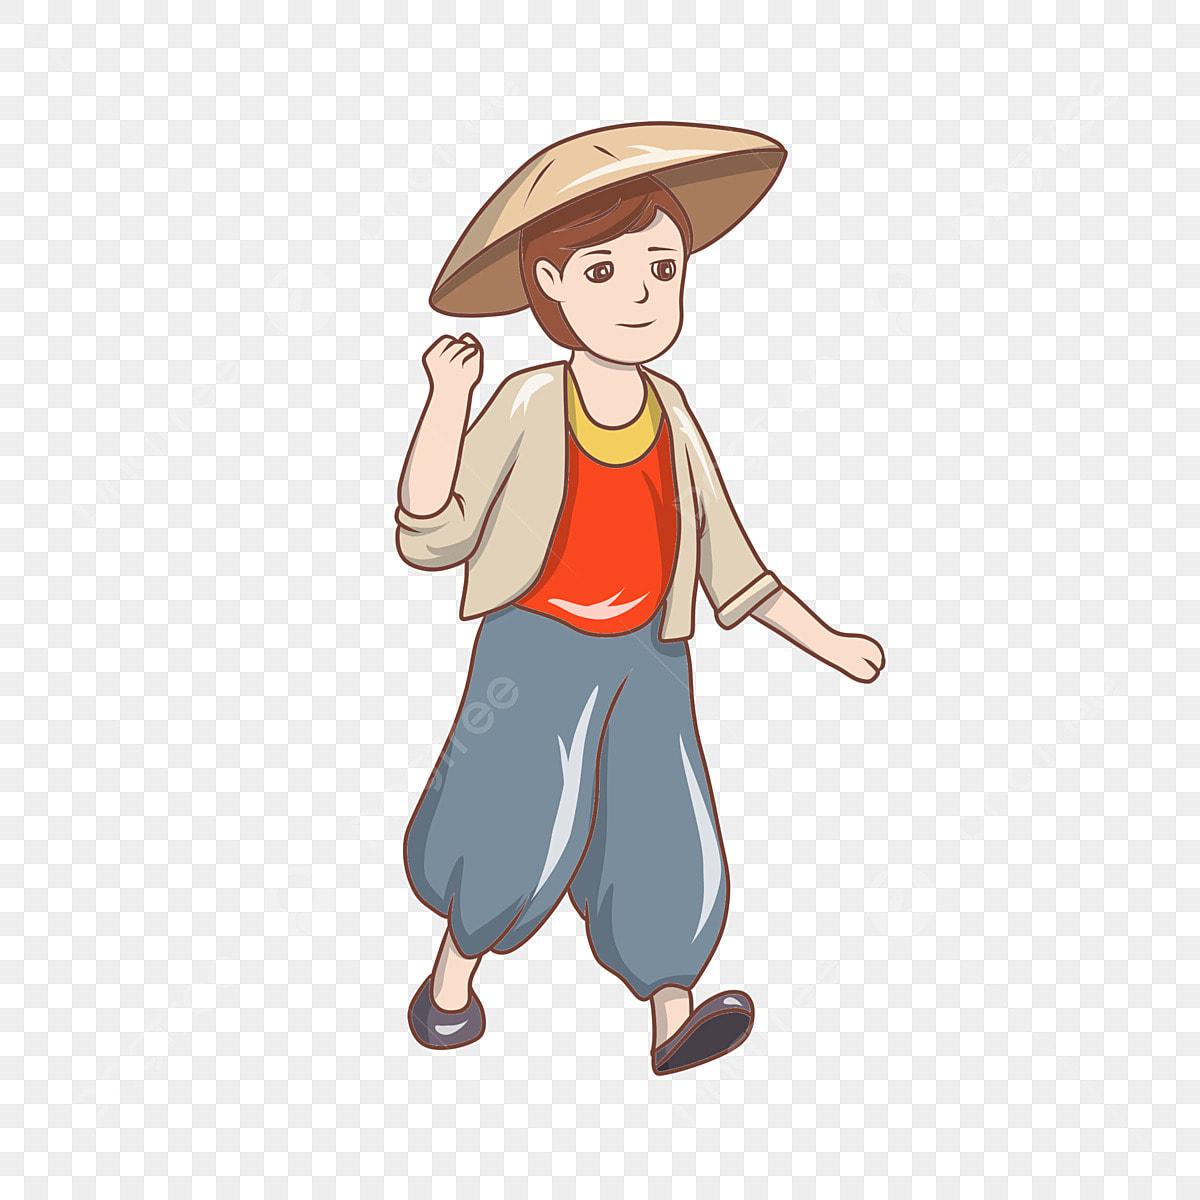 Boy Cartoon PNG Vector And PSD Files